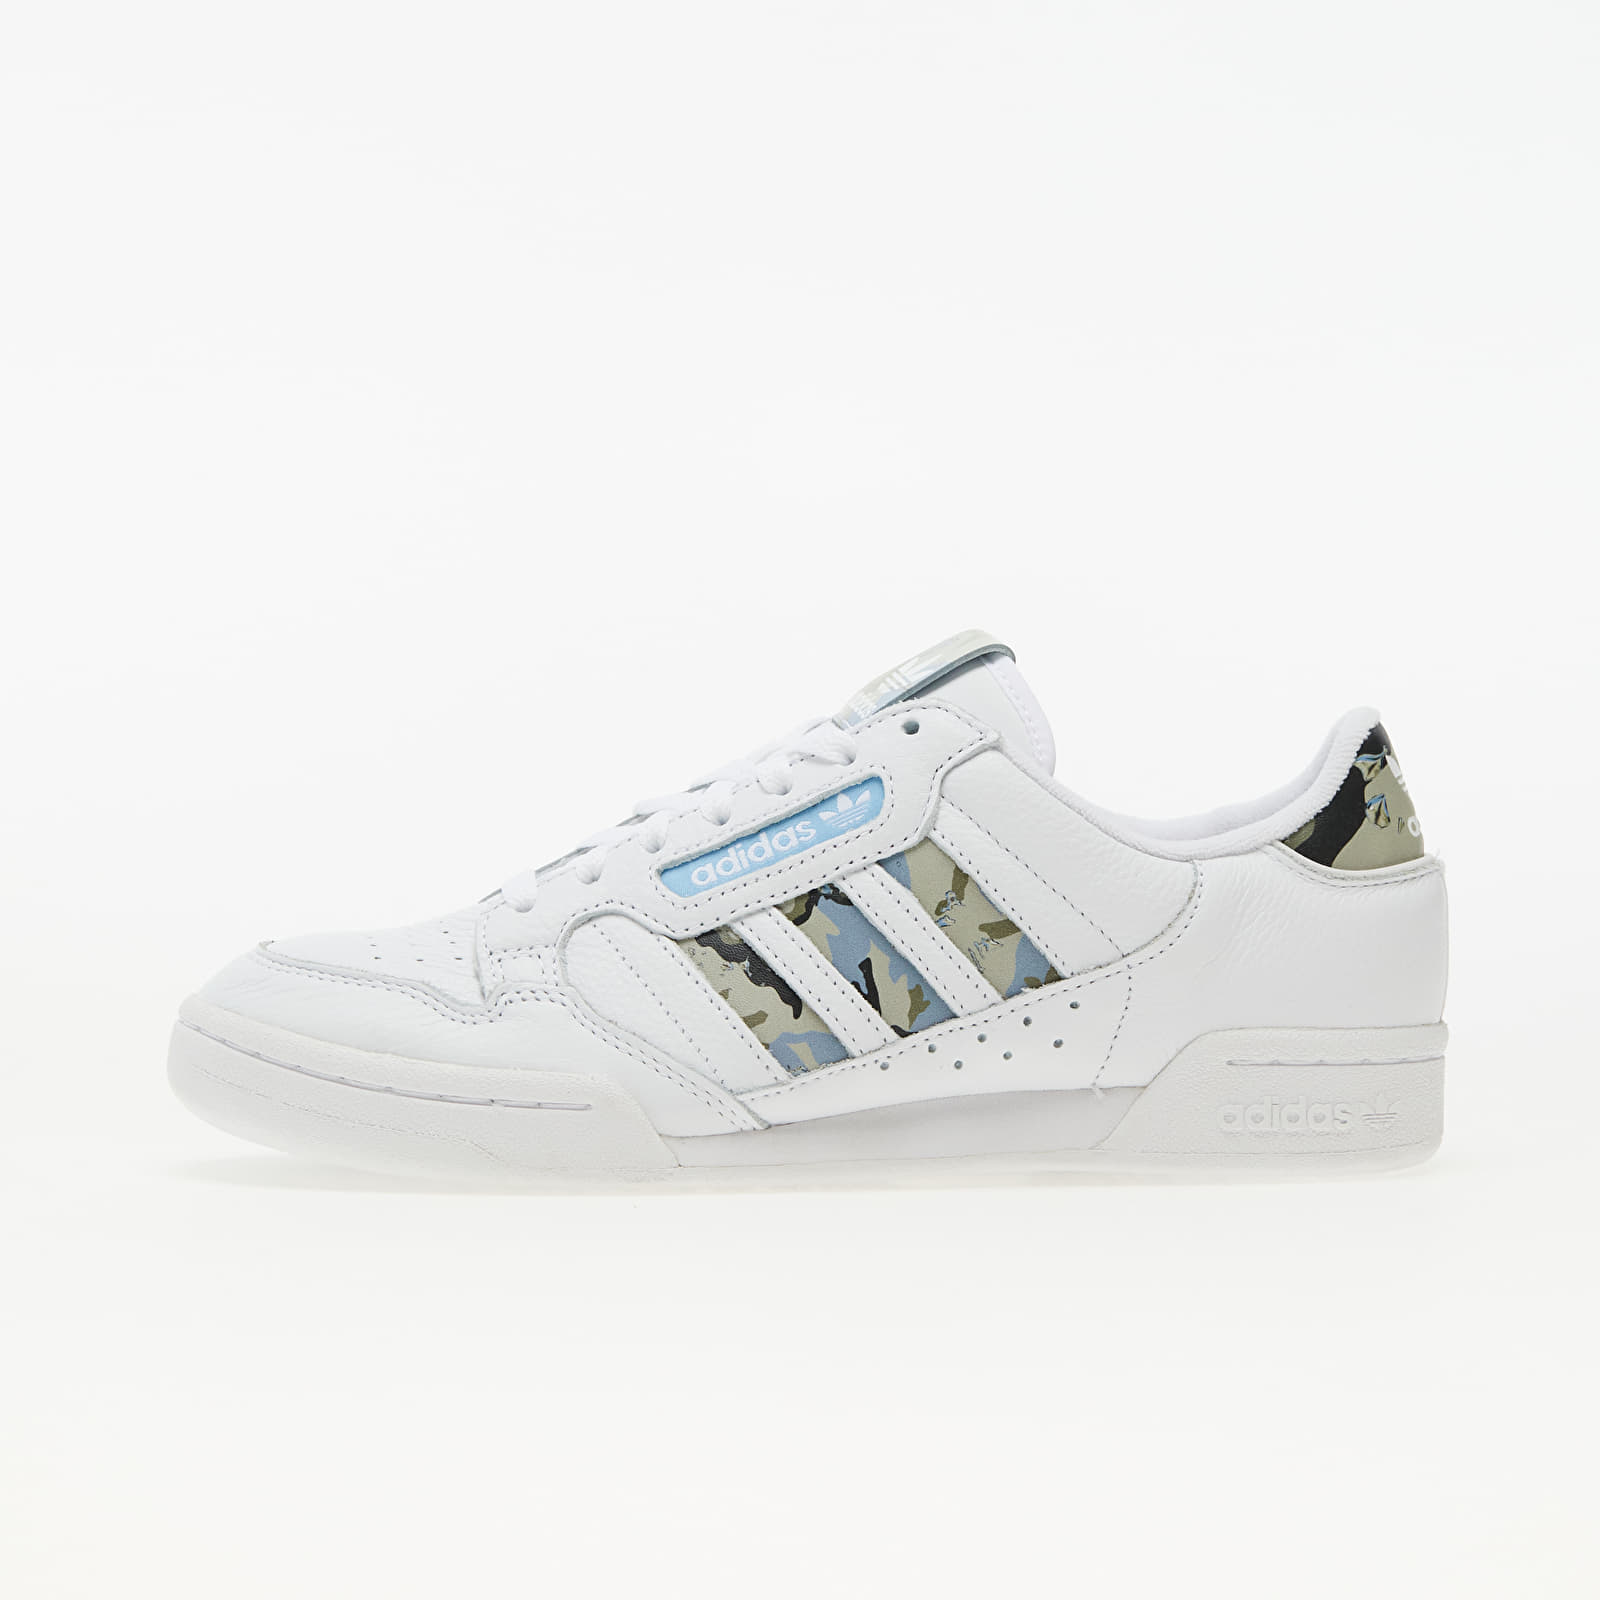 adidas Continental 80 Stripe Ftw White/ Core Black/ Ftw White EUR 46